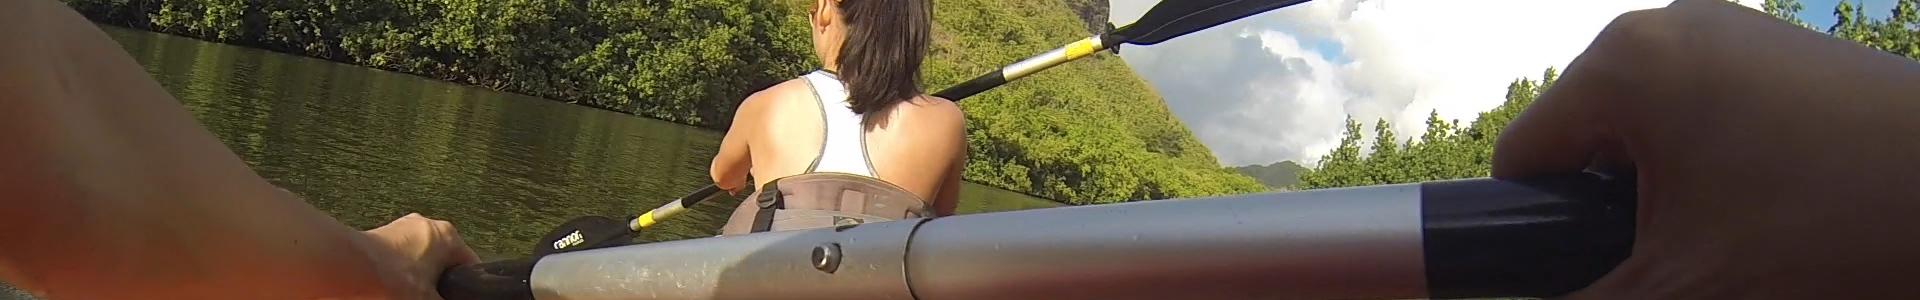 Wailua River and Secret Falls - Kauai